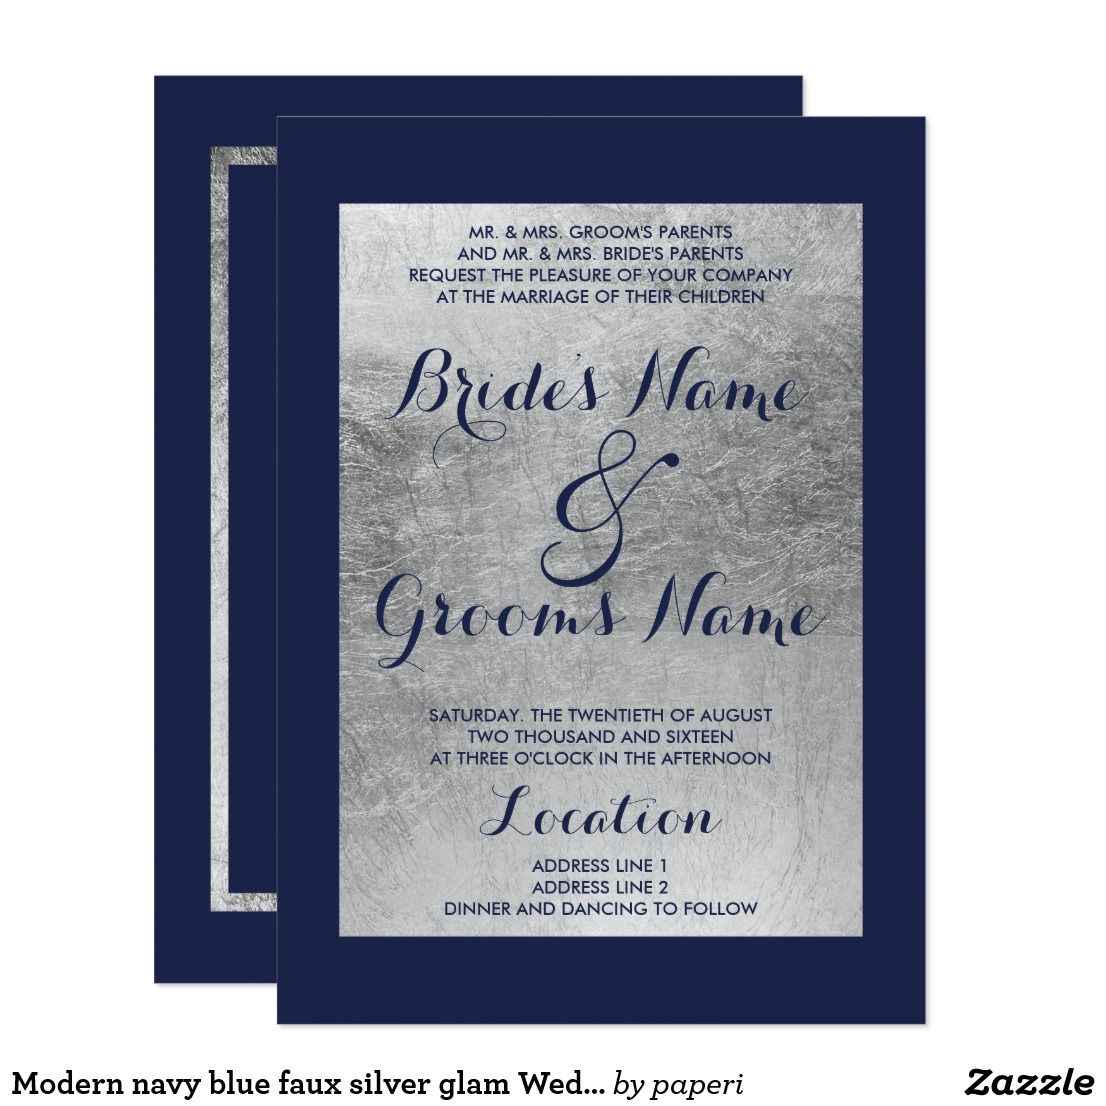 Modern Navy Blue Faux Silver Glam Wedding Invitation Elegant Stylish And Invitationthis Luxury Simple: Blue And Silver Elegant Wedding Invitations At Websimilar.org